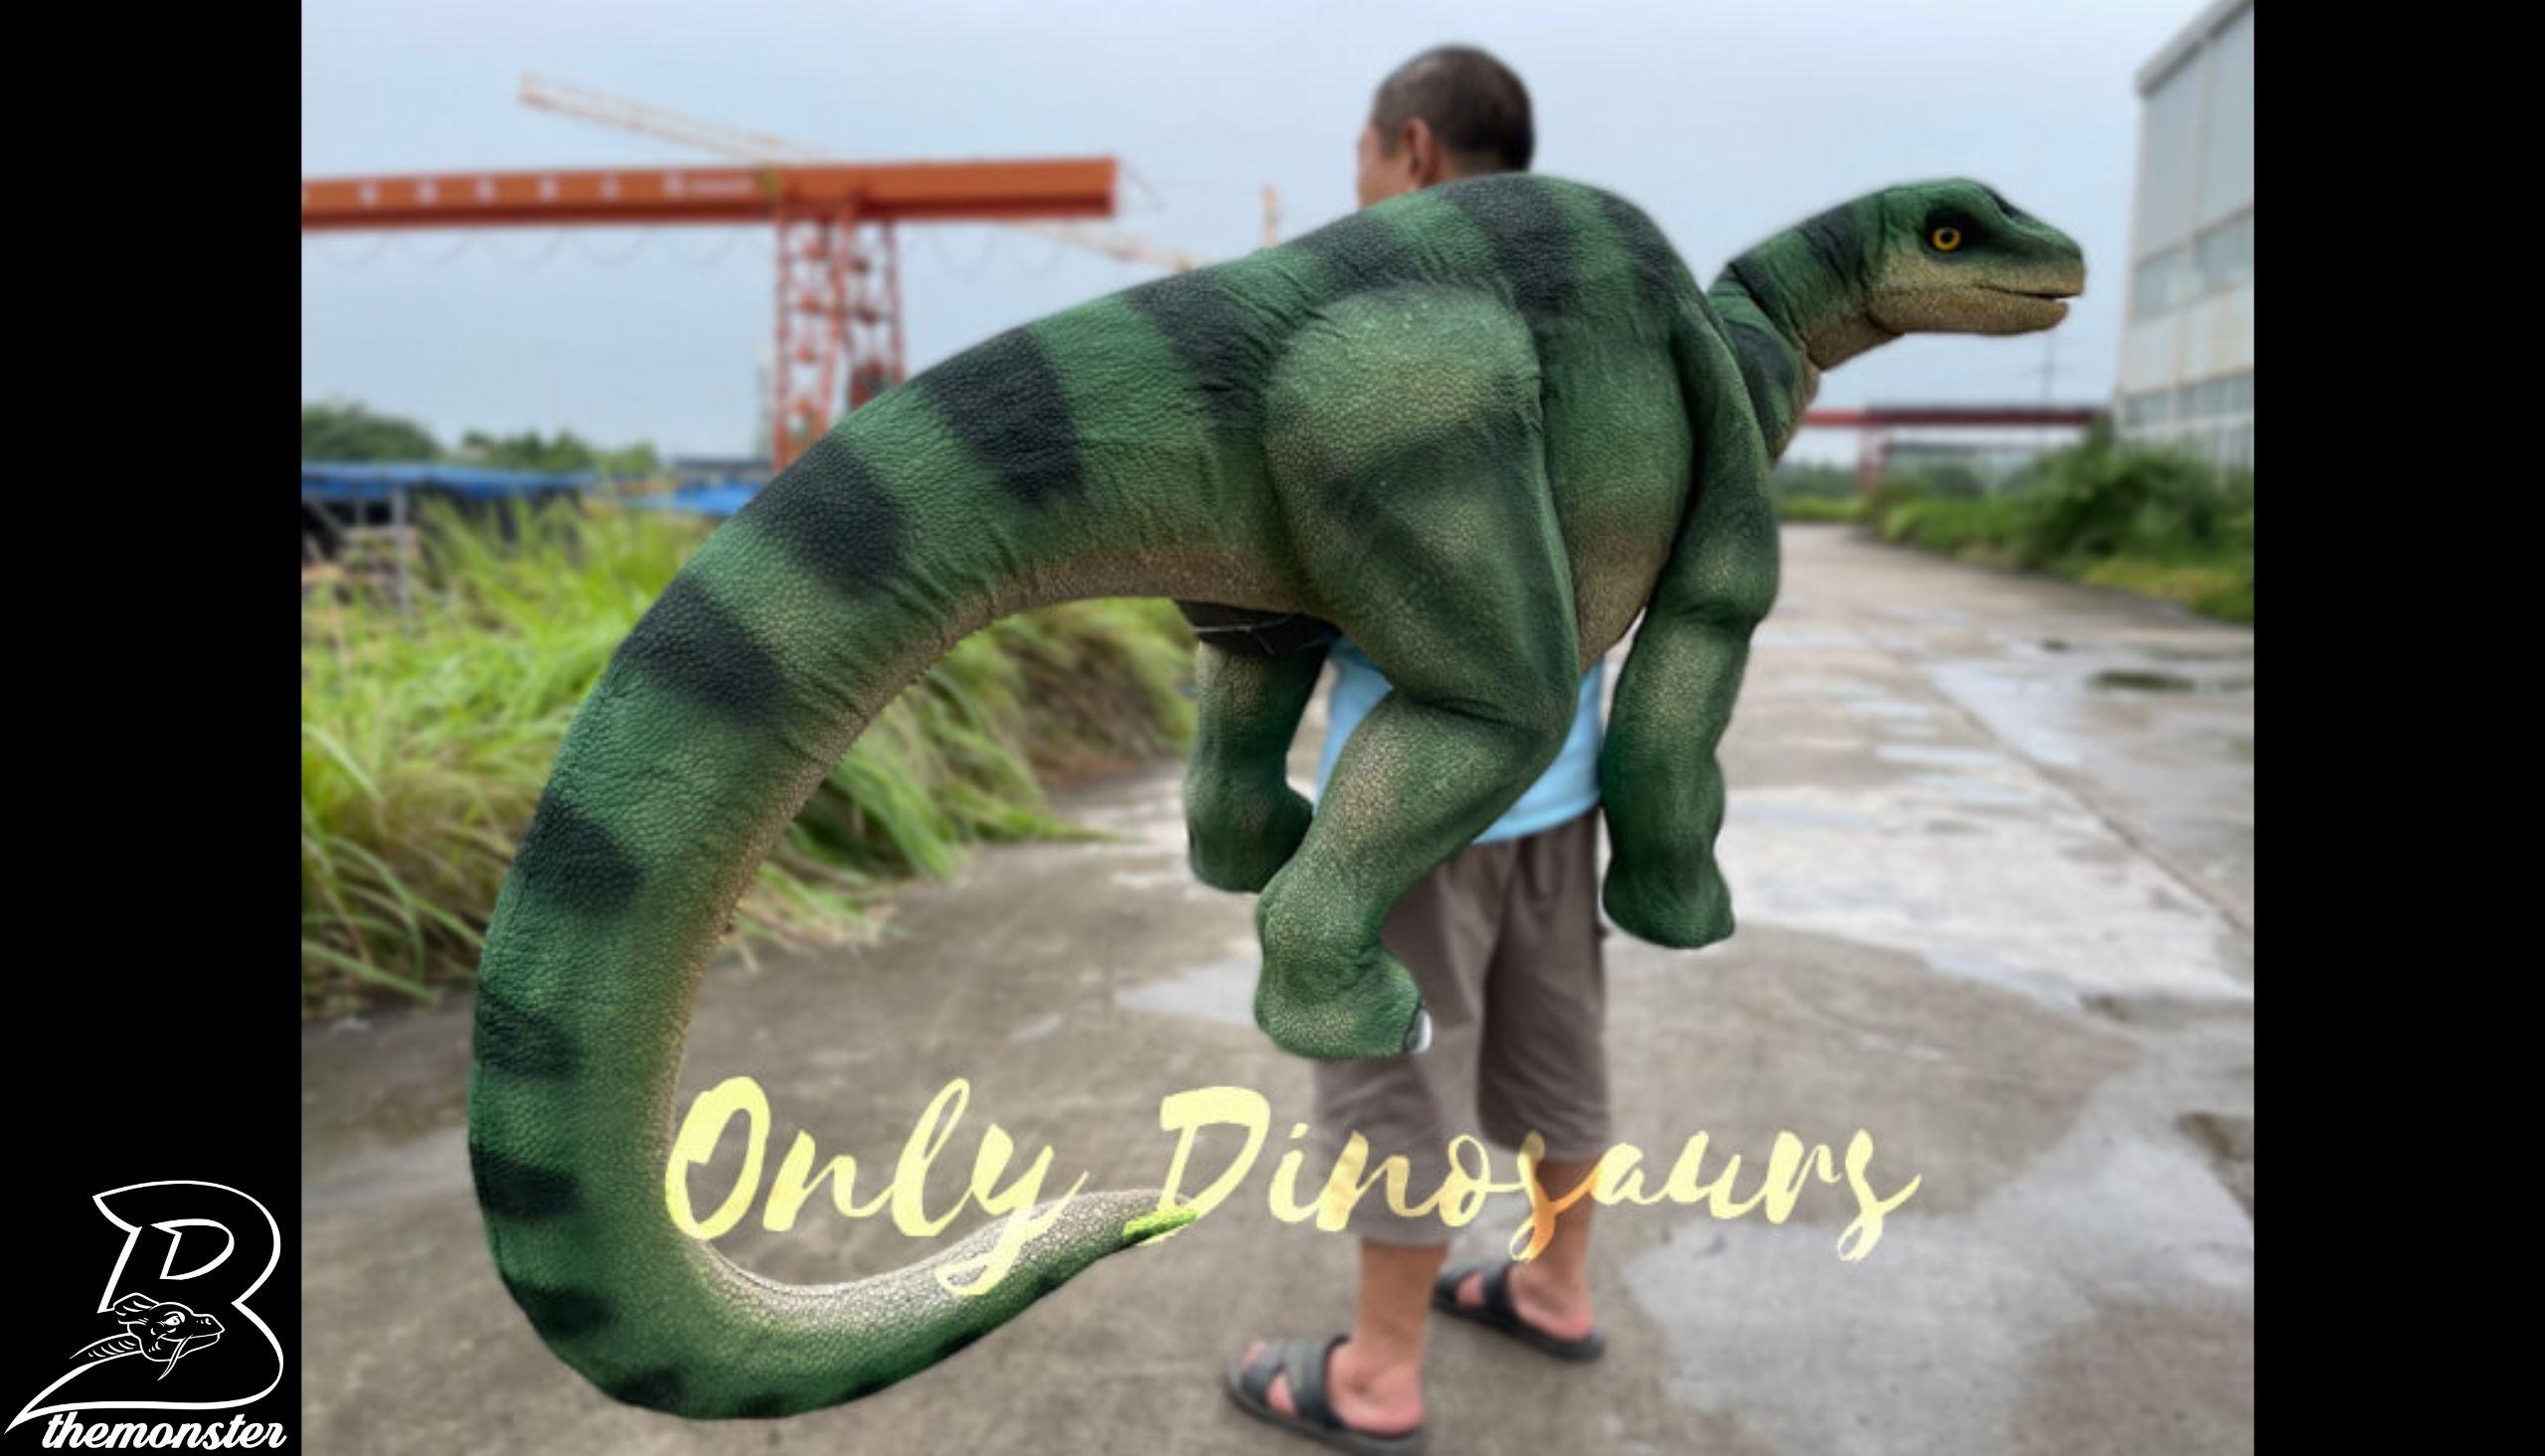 Vivid Brontosaurus Dino Shoulder Puppet in vendita sul Bthemonster.com